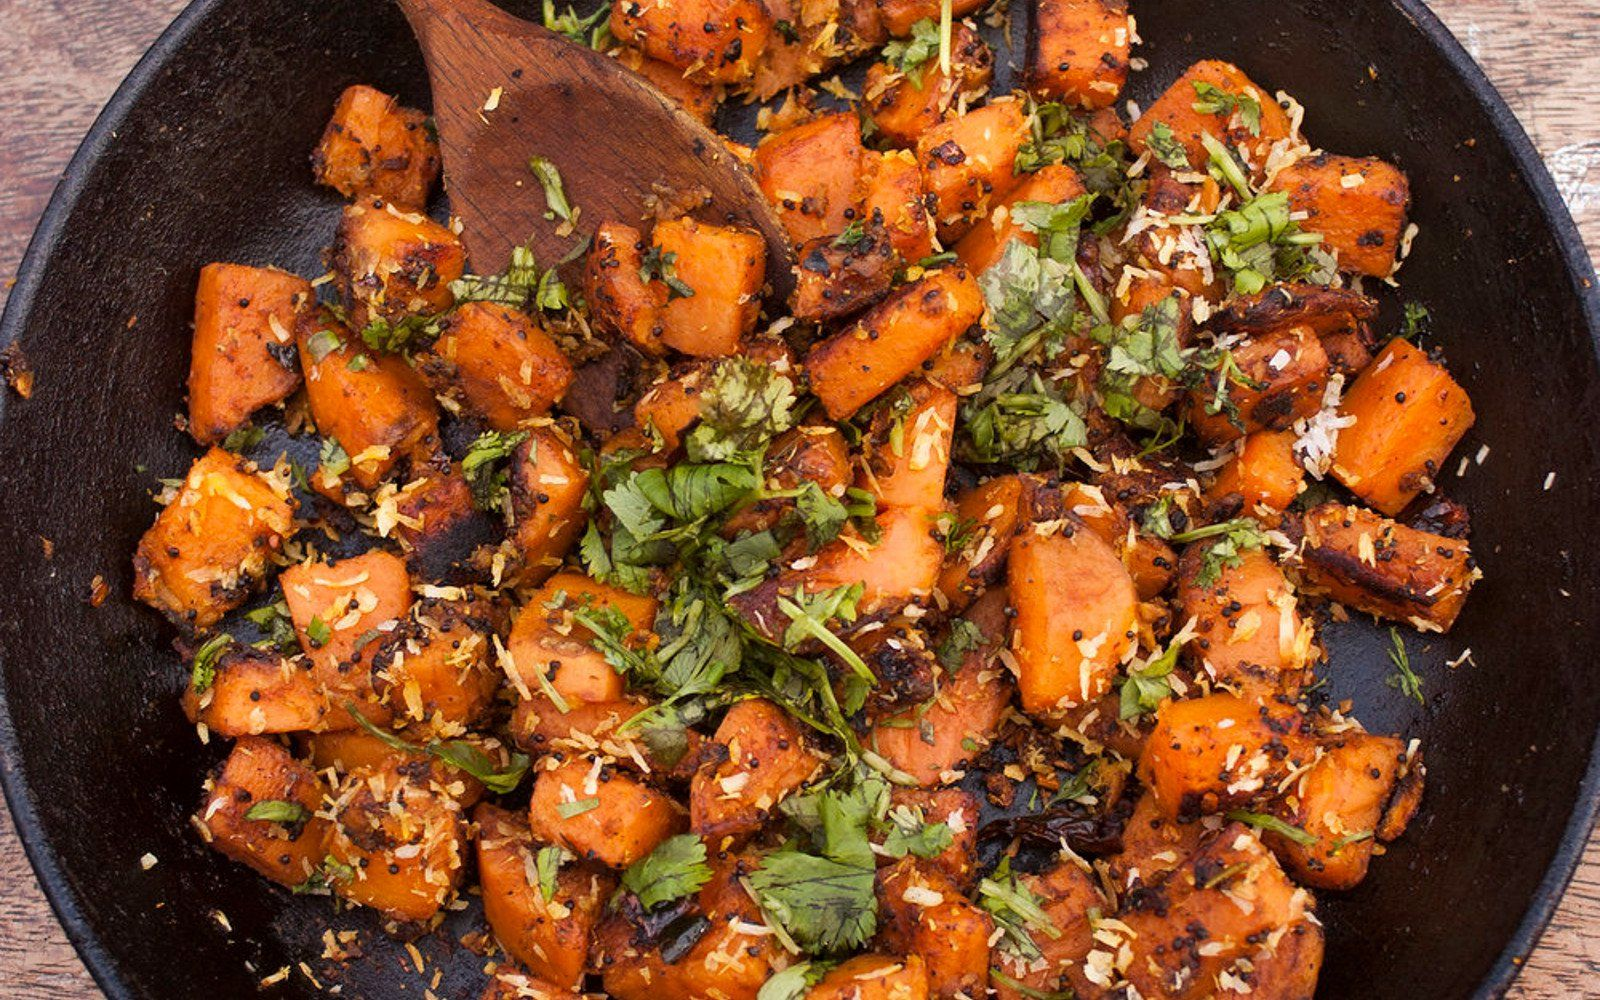 Sweet potato with tamarind and coconut vegan gluten free sweet potato with tamarind and coconut vegan gluten free indian foodsindian recipesvegan rawvegan forumfinder Images